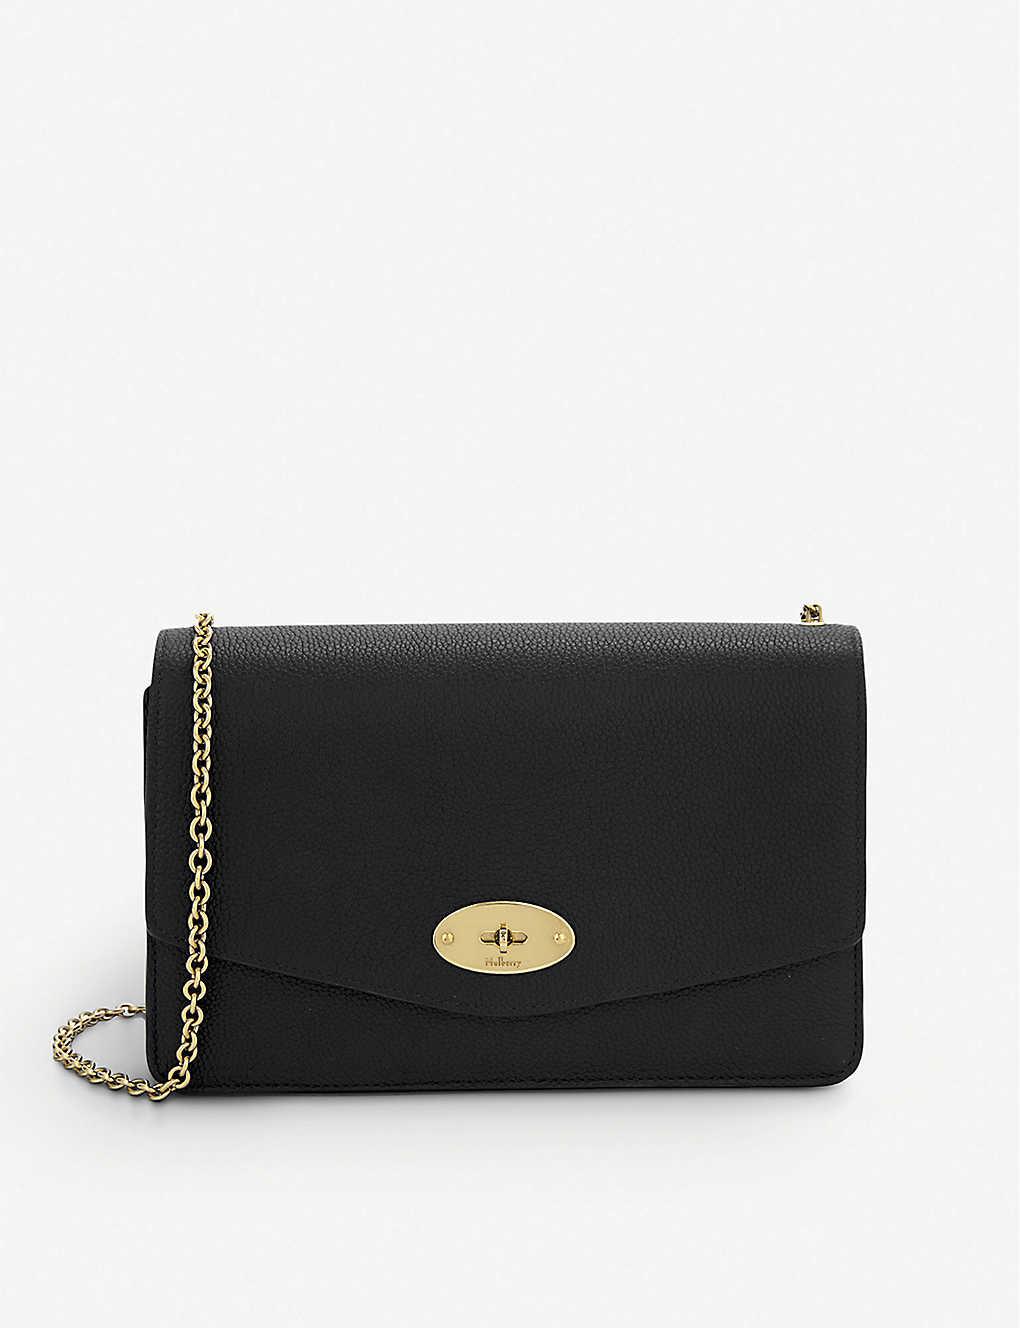 beb2facddf3 MULBERRY - Small Darley leather clutch | Selfridges.com